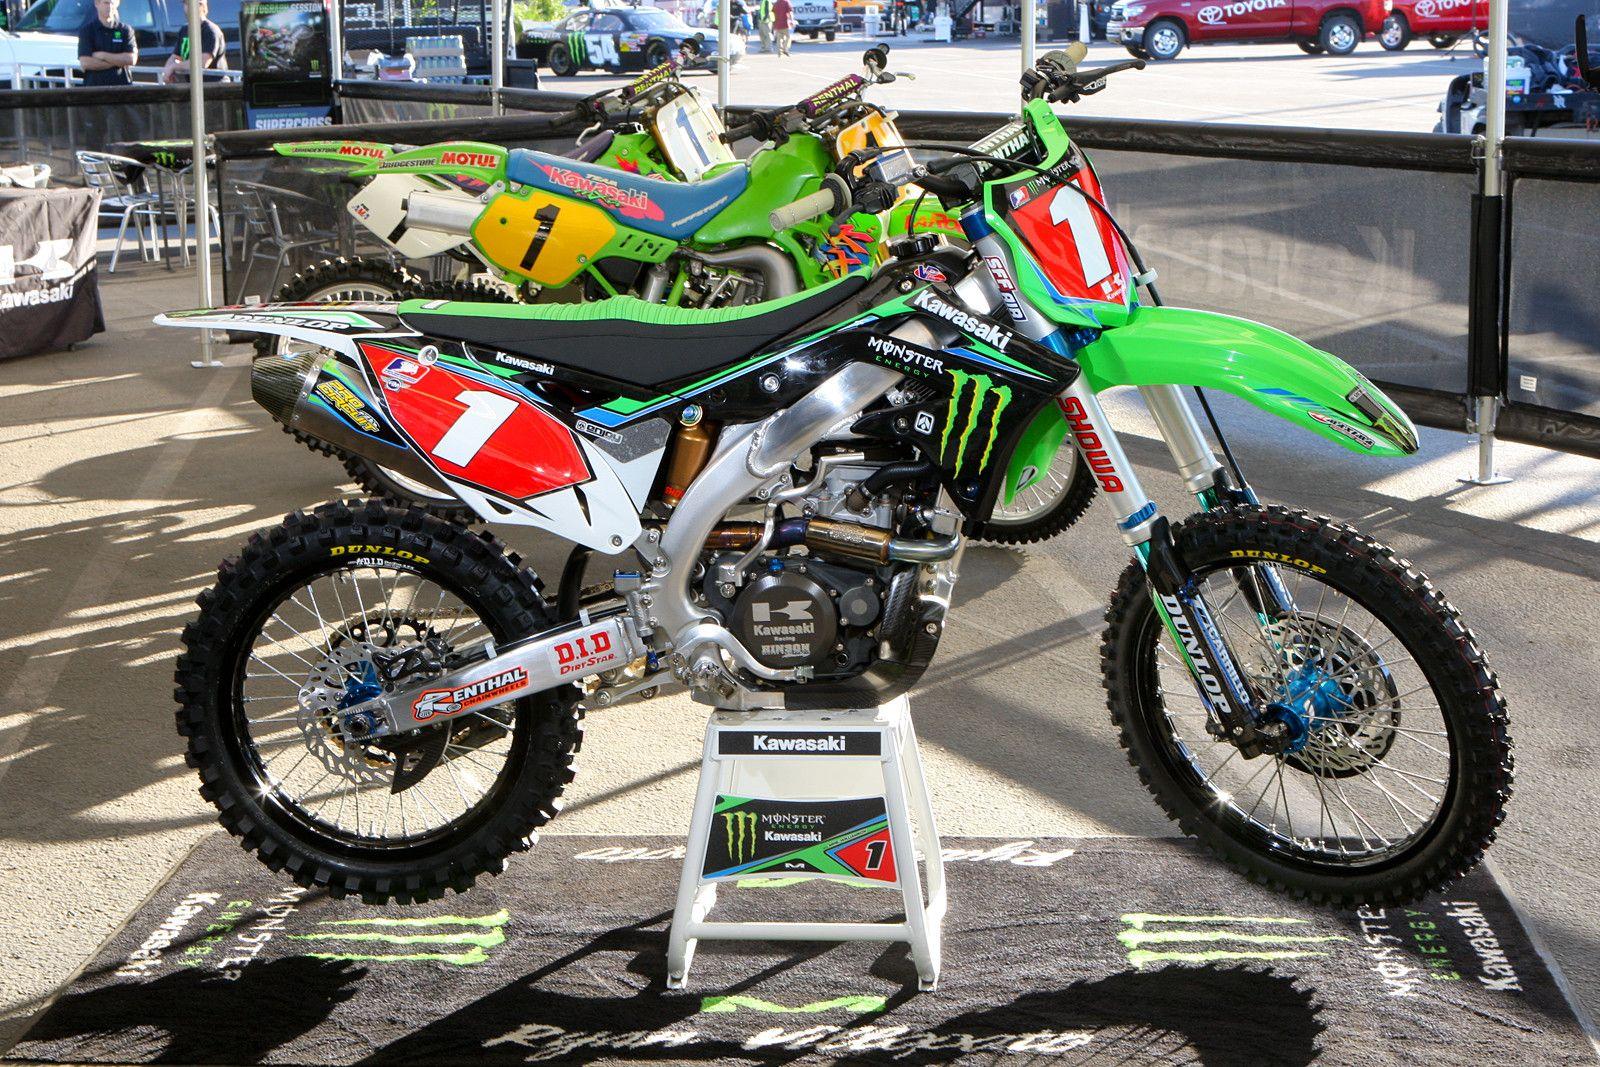 Kawasaki KX 450 Ryan Villopoto - Team Monster Energy Kawasaki Jake